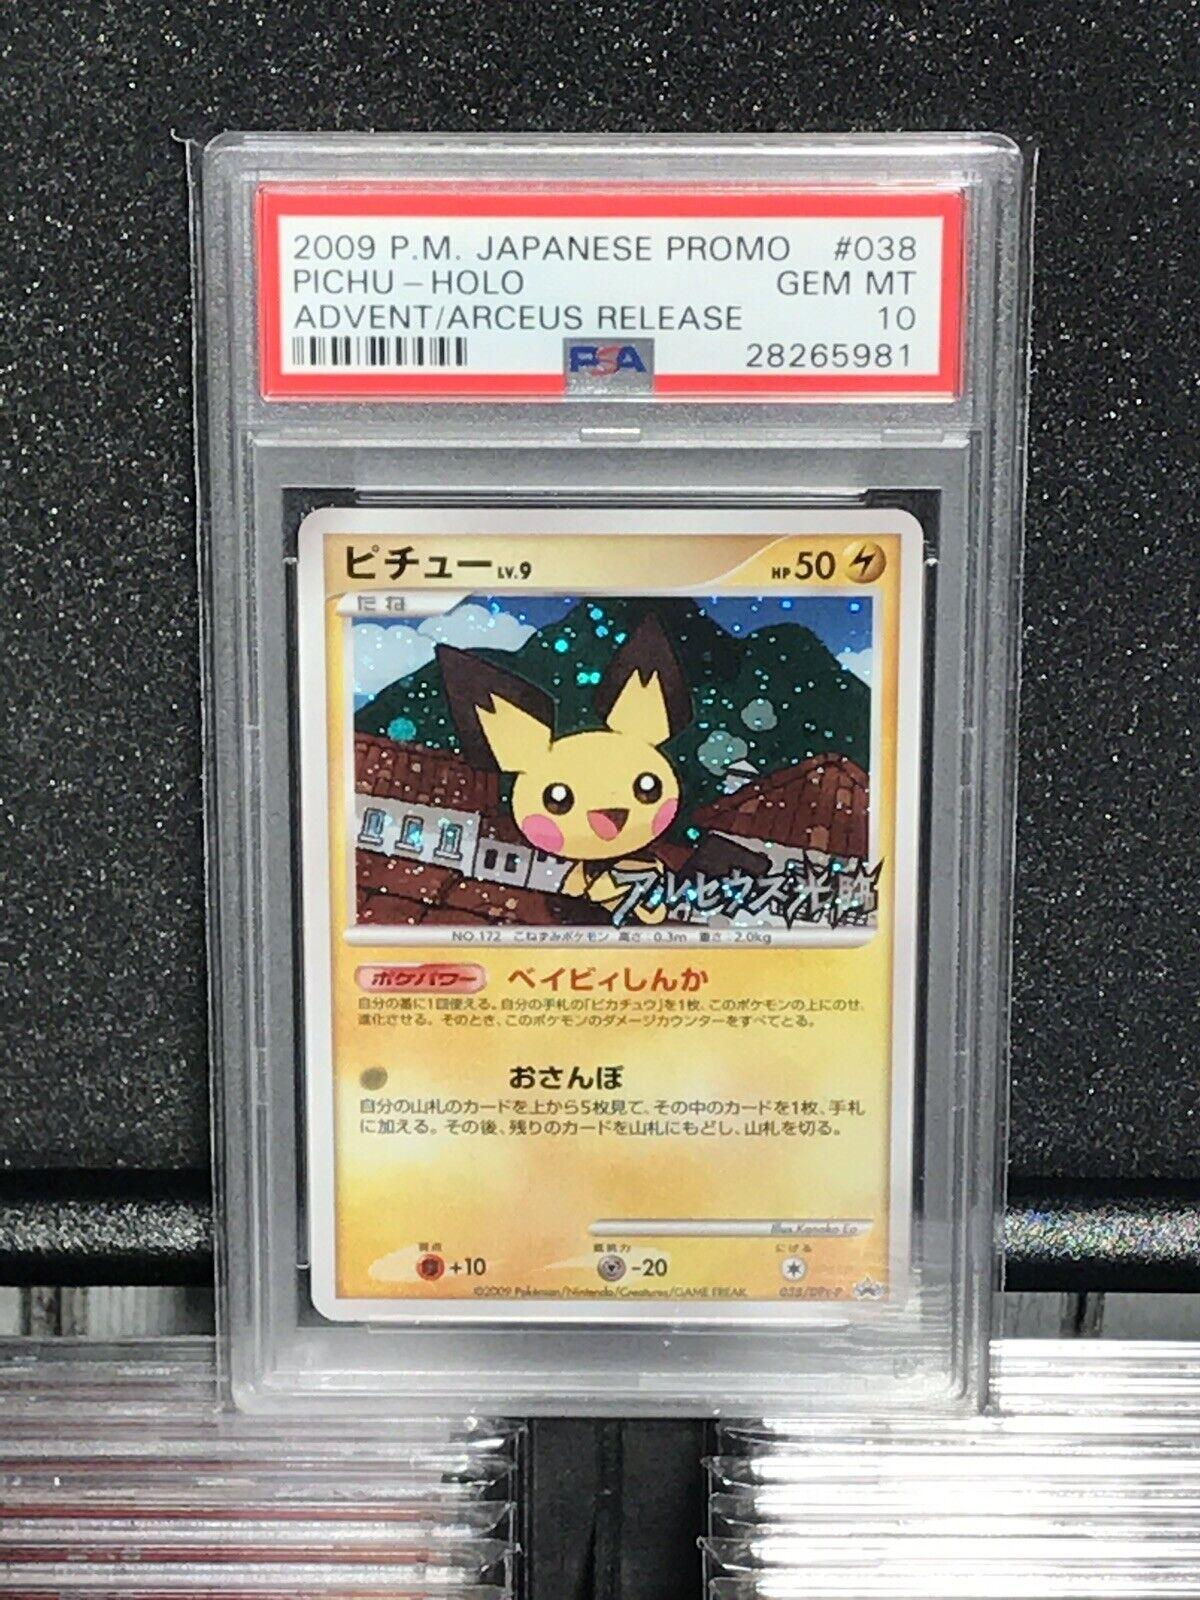 PSA 10 POKEMON PICHU CARD JAPANESE PROMO PROMO PROMO 038 DP-P ADVENT ARCEUS RELEASE 2009 TCG a2c7ef